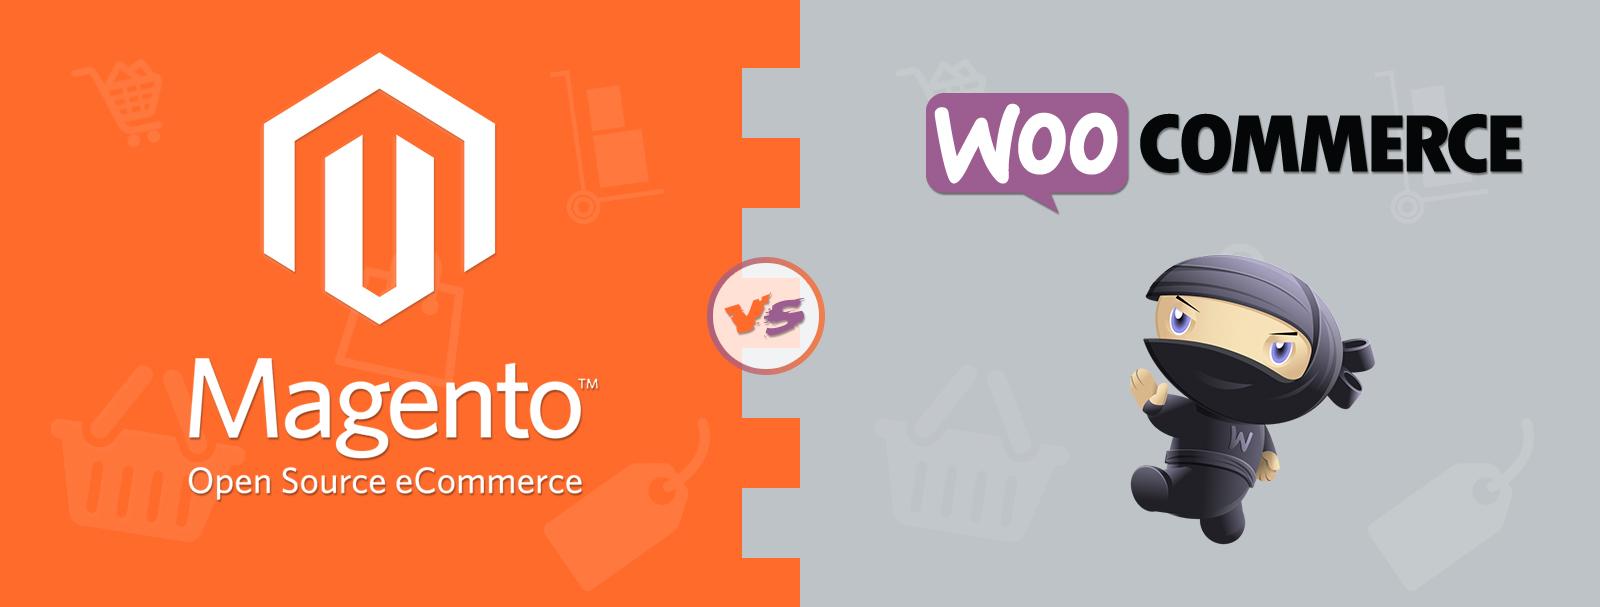 Magento vs Woocommerce: guía para elegir CMS